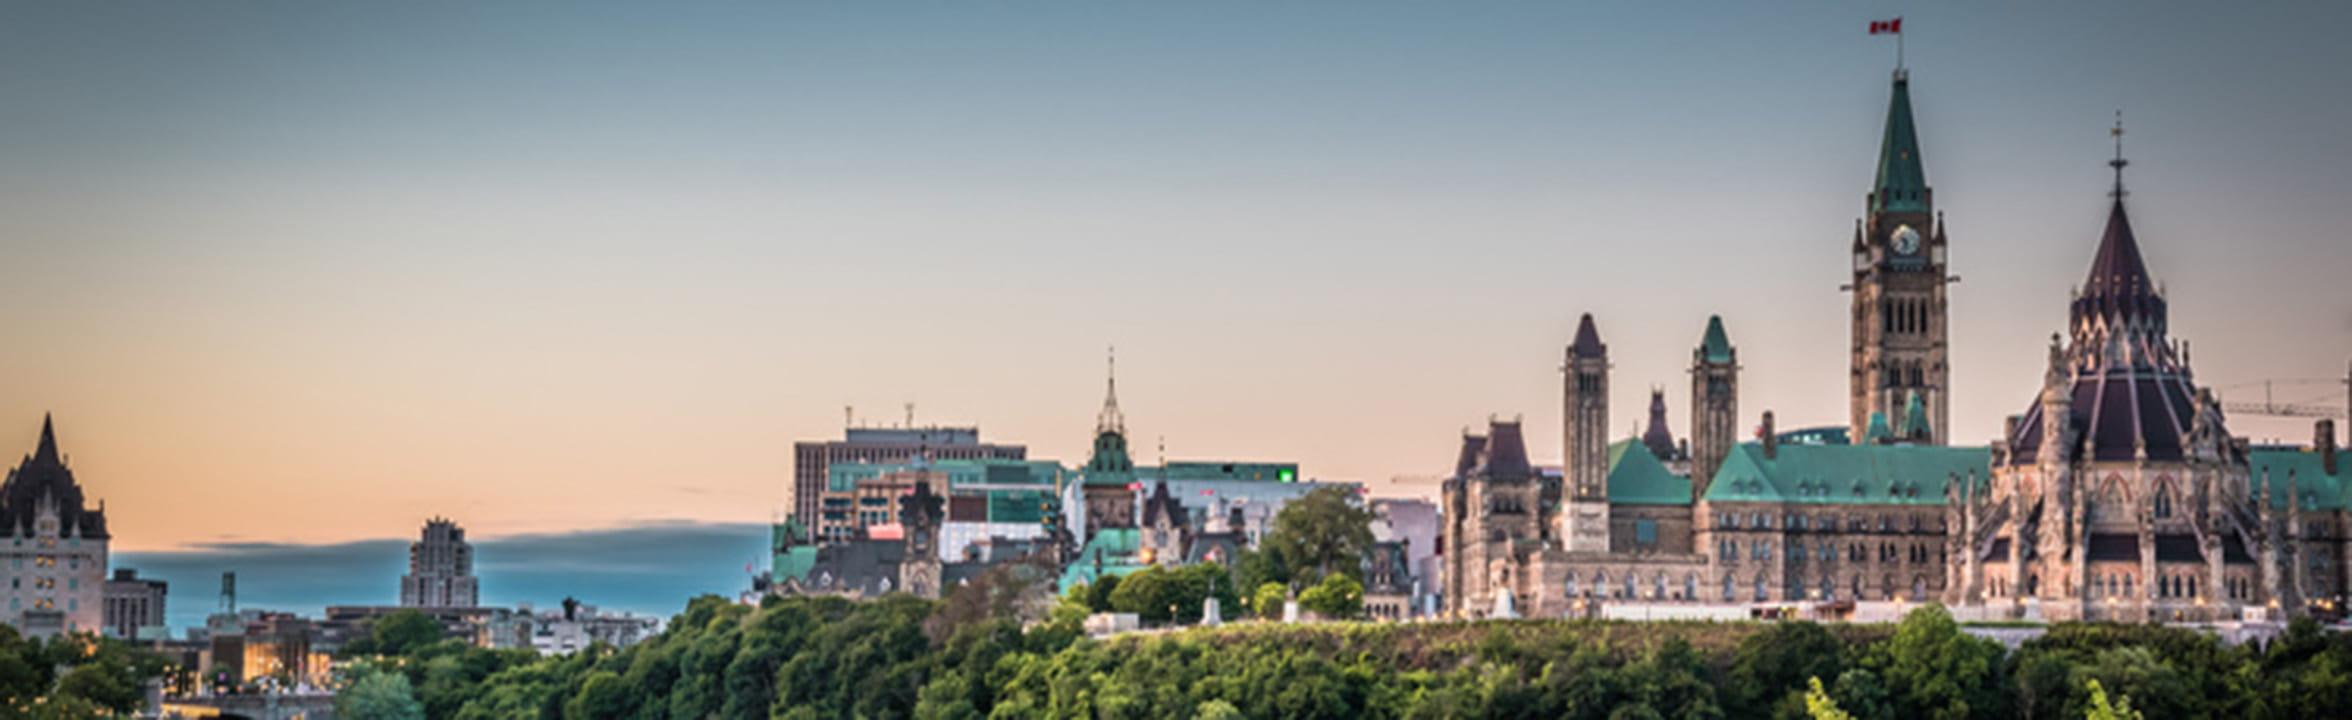 Ottawa Ontario, Canada